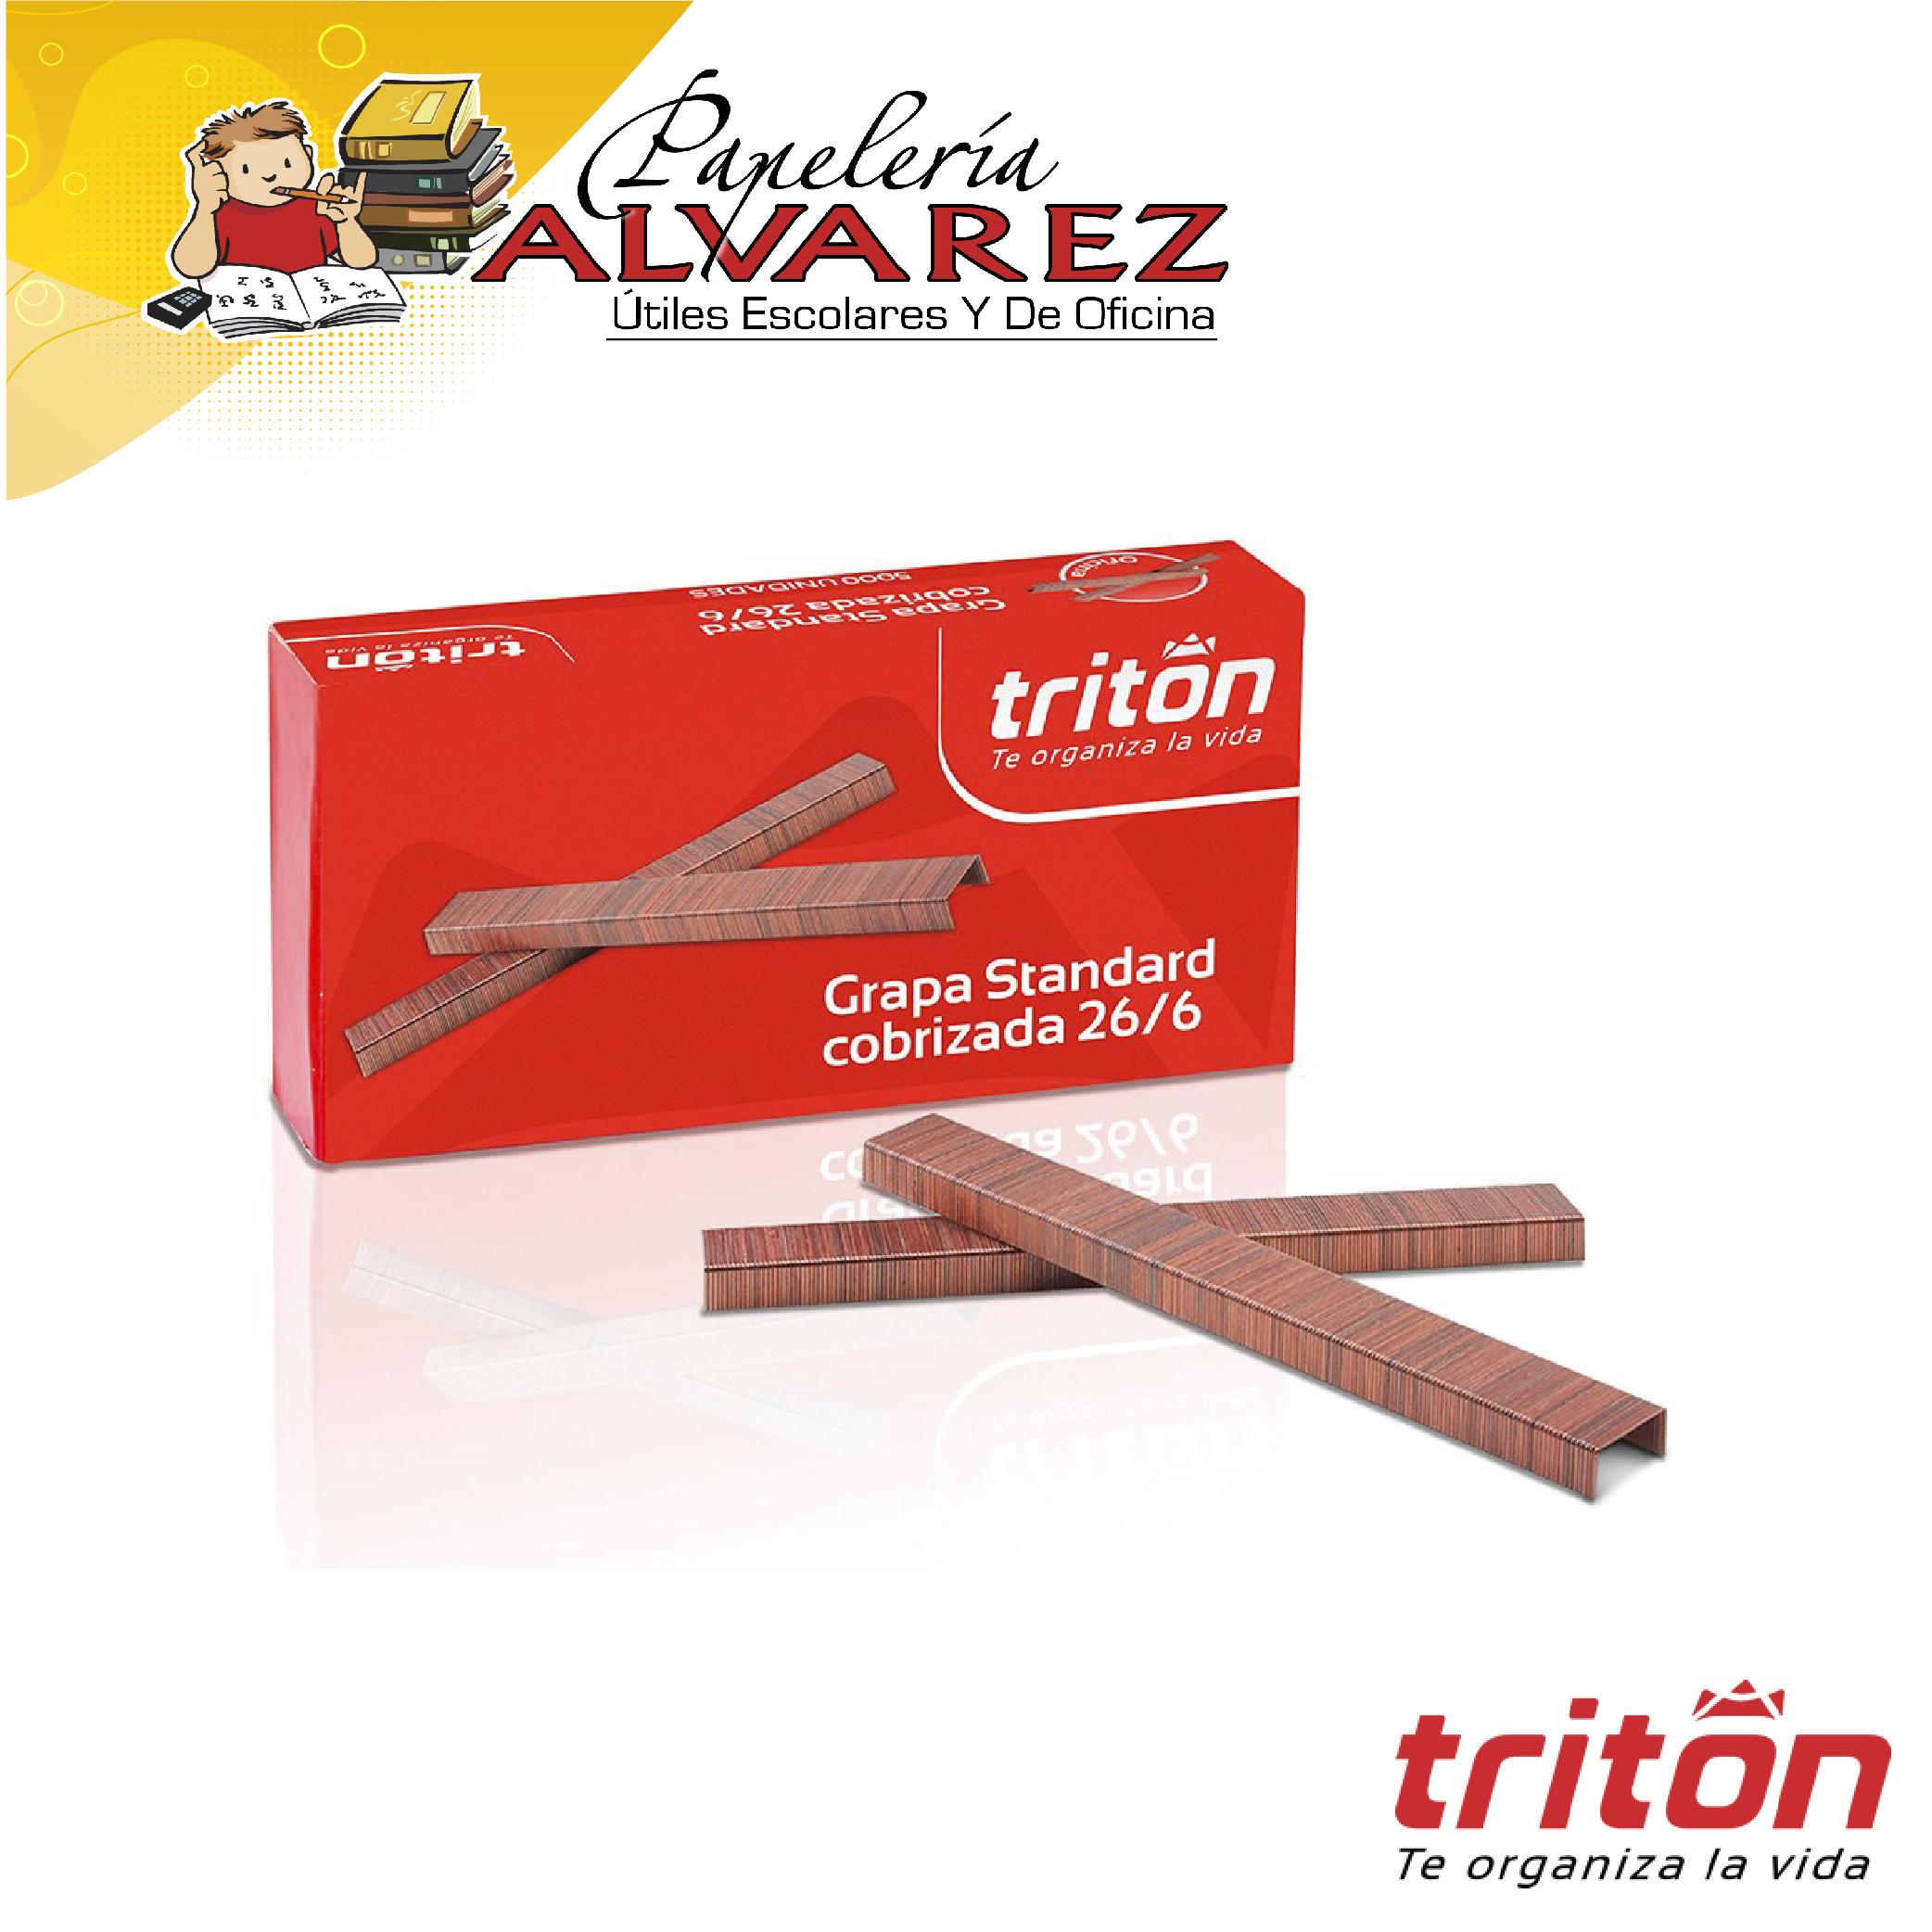 GRAPA COSEDORA TRITON COBRIZADO X 5000